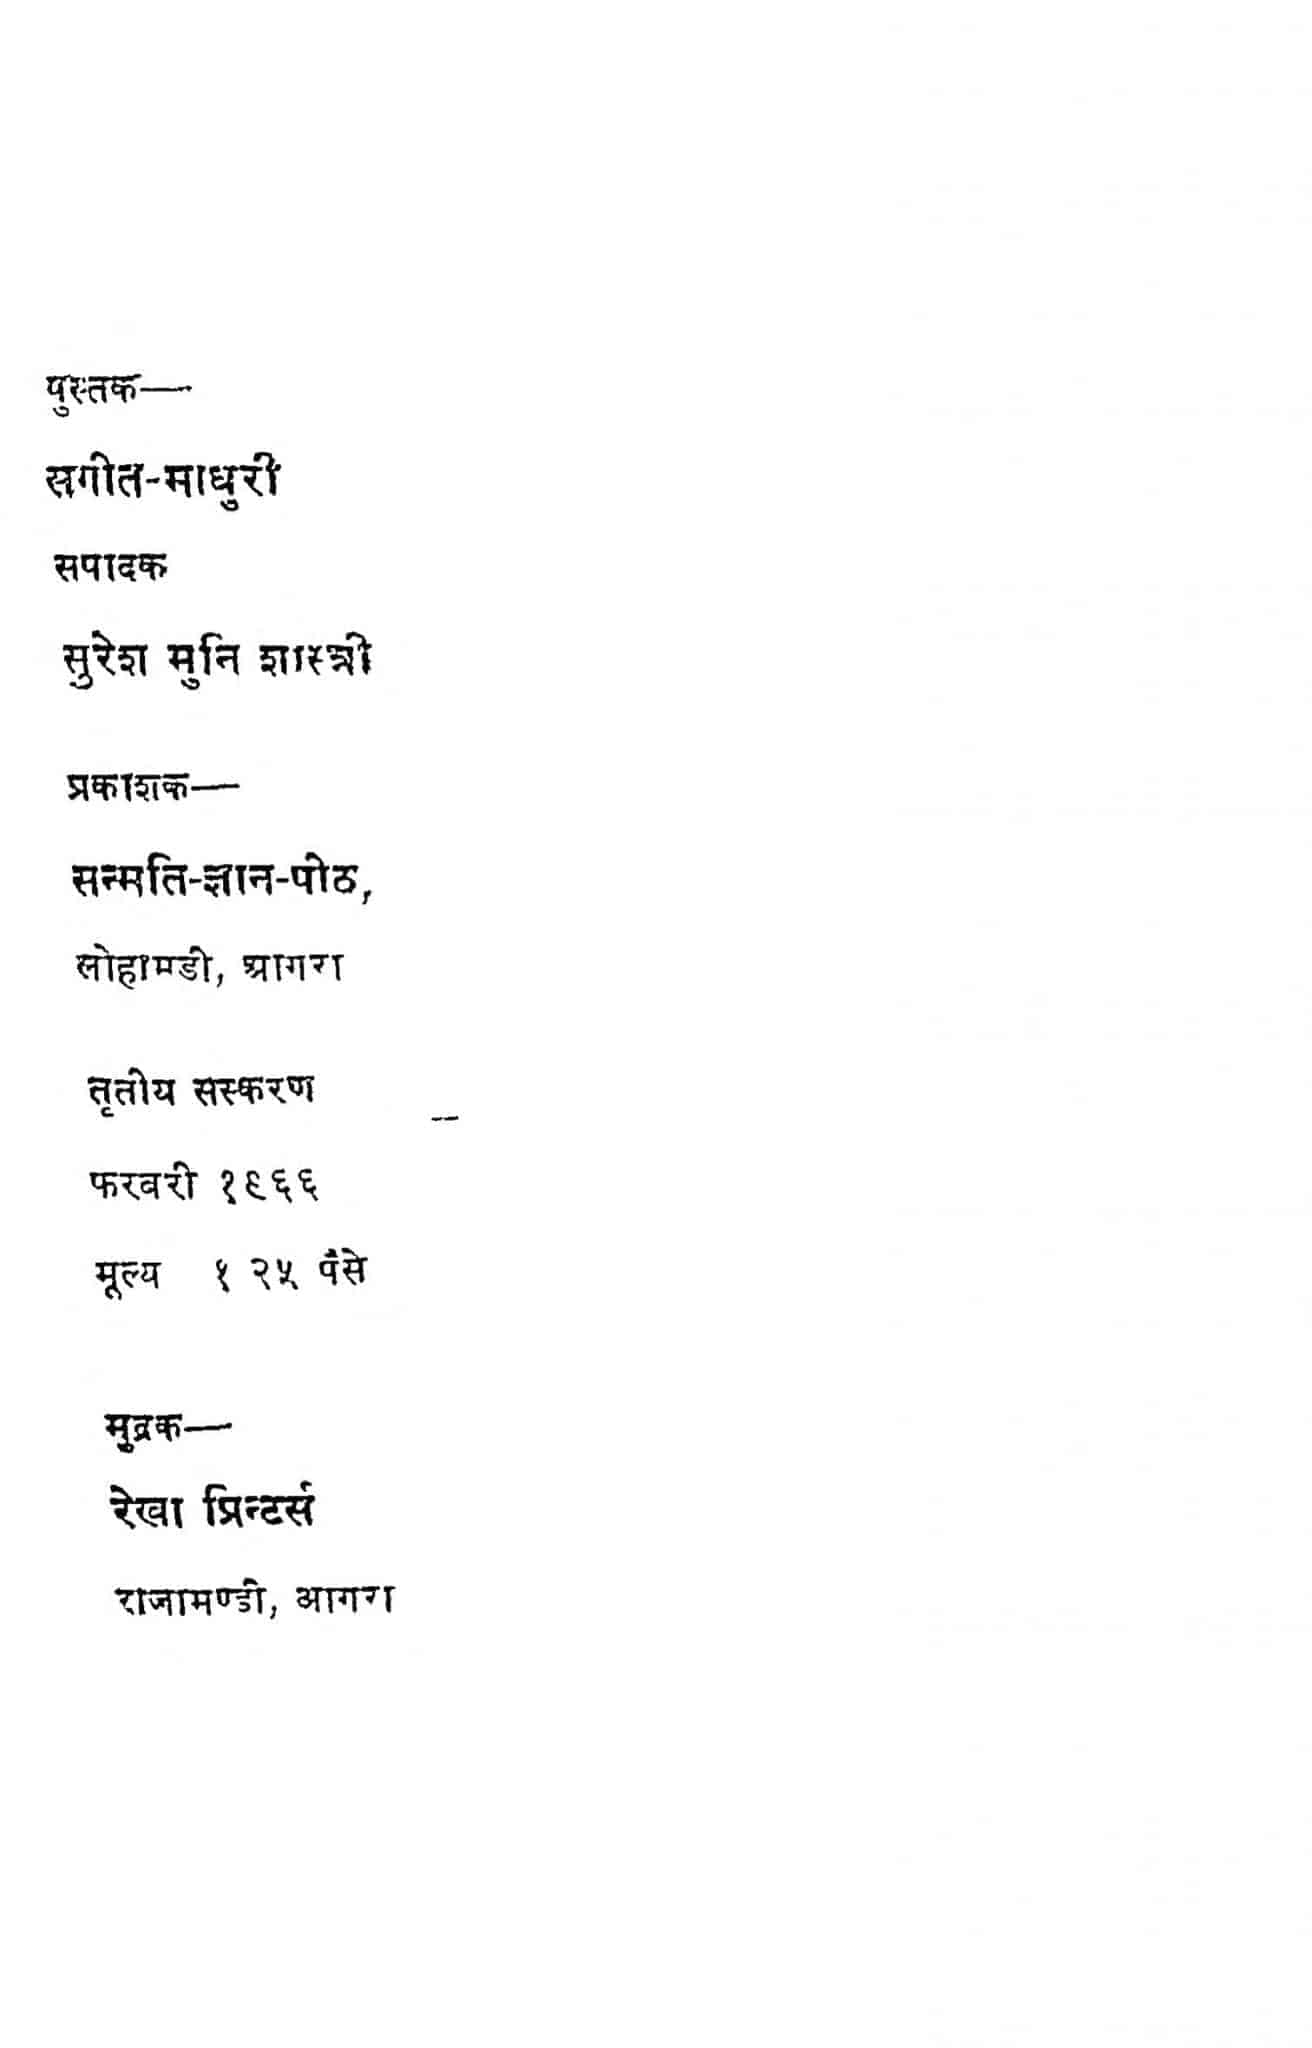 Sangeet Madhuri by सुरेश मुनि - Suresh Muni